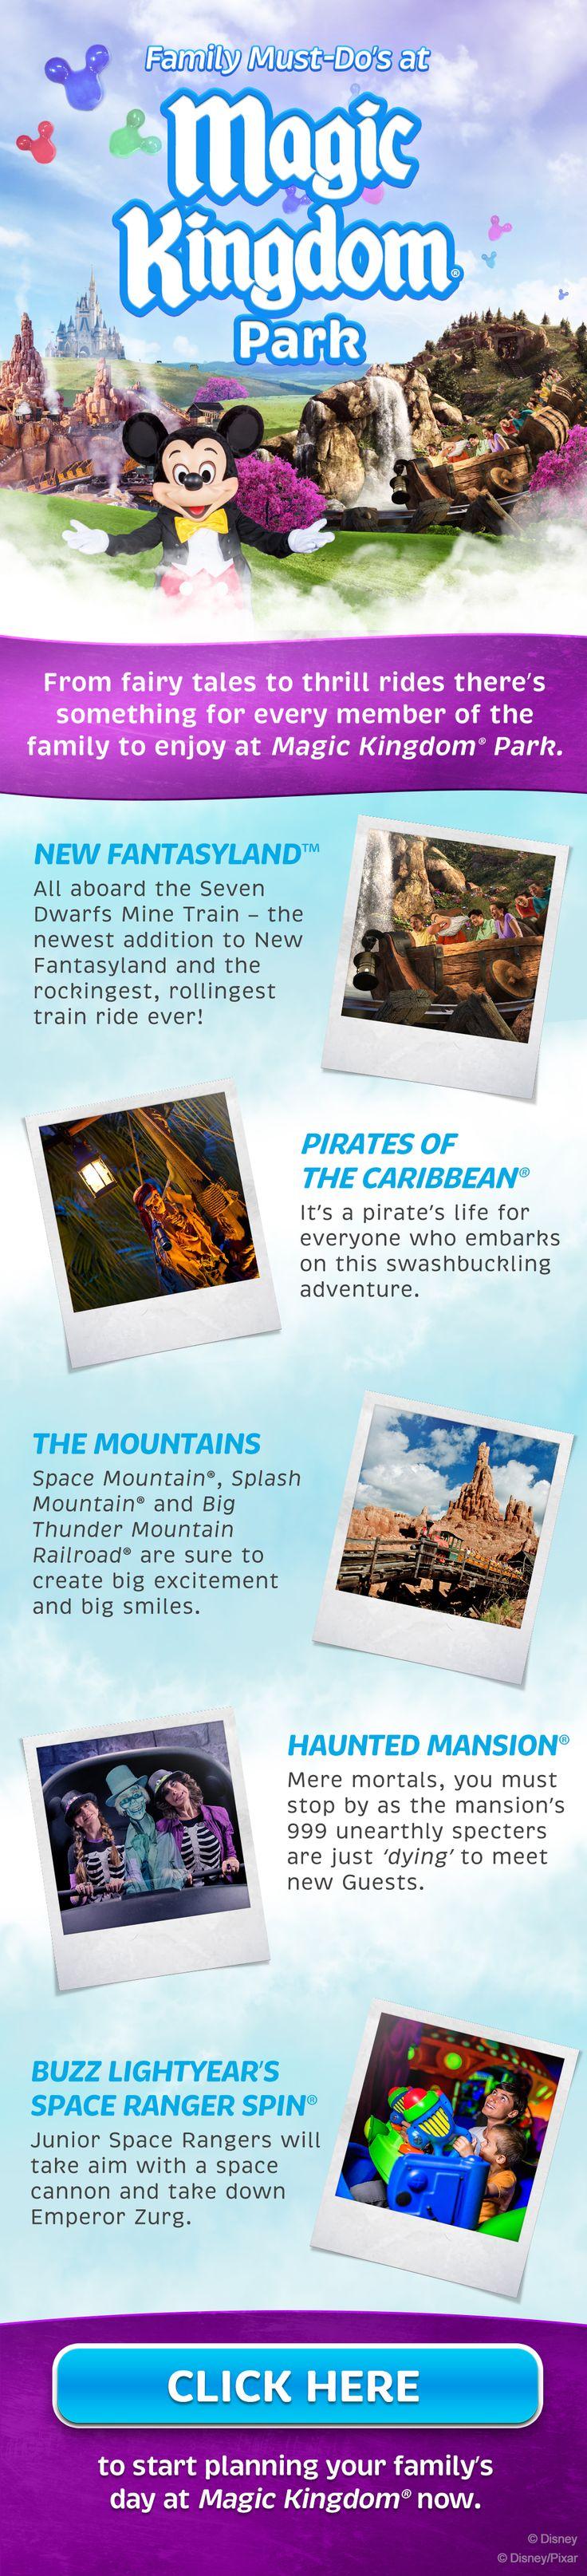 Family Must-Do's at Magic Kingdom at Walt Disney World! New Fantasyland, Pirates of the Caribbean, Splash Mountain, Haunted Mansion and Buzz Lightyear!